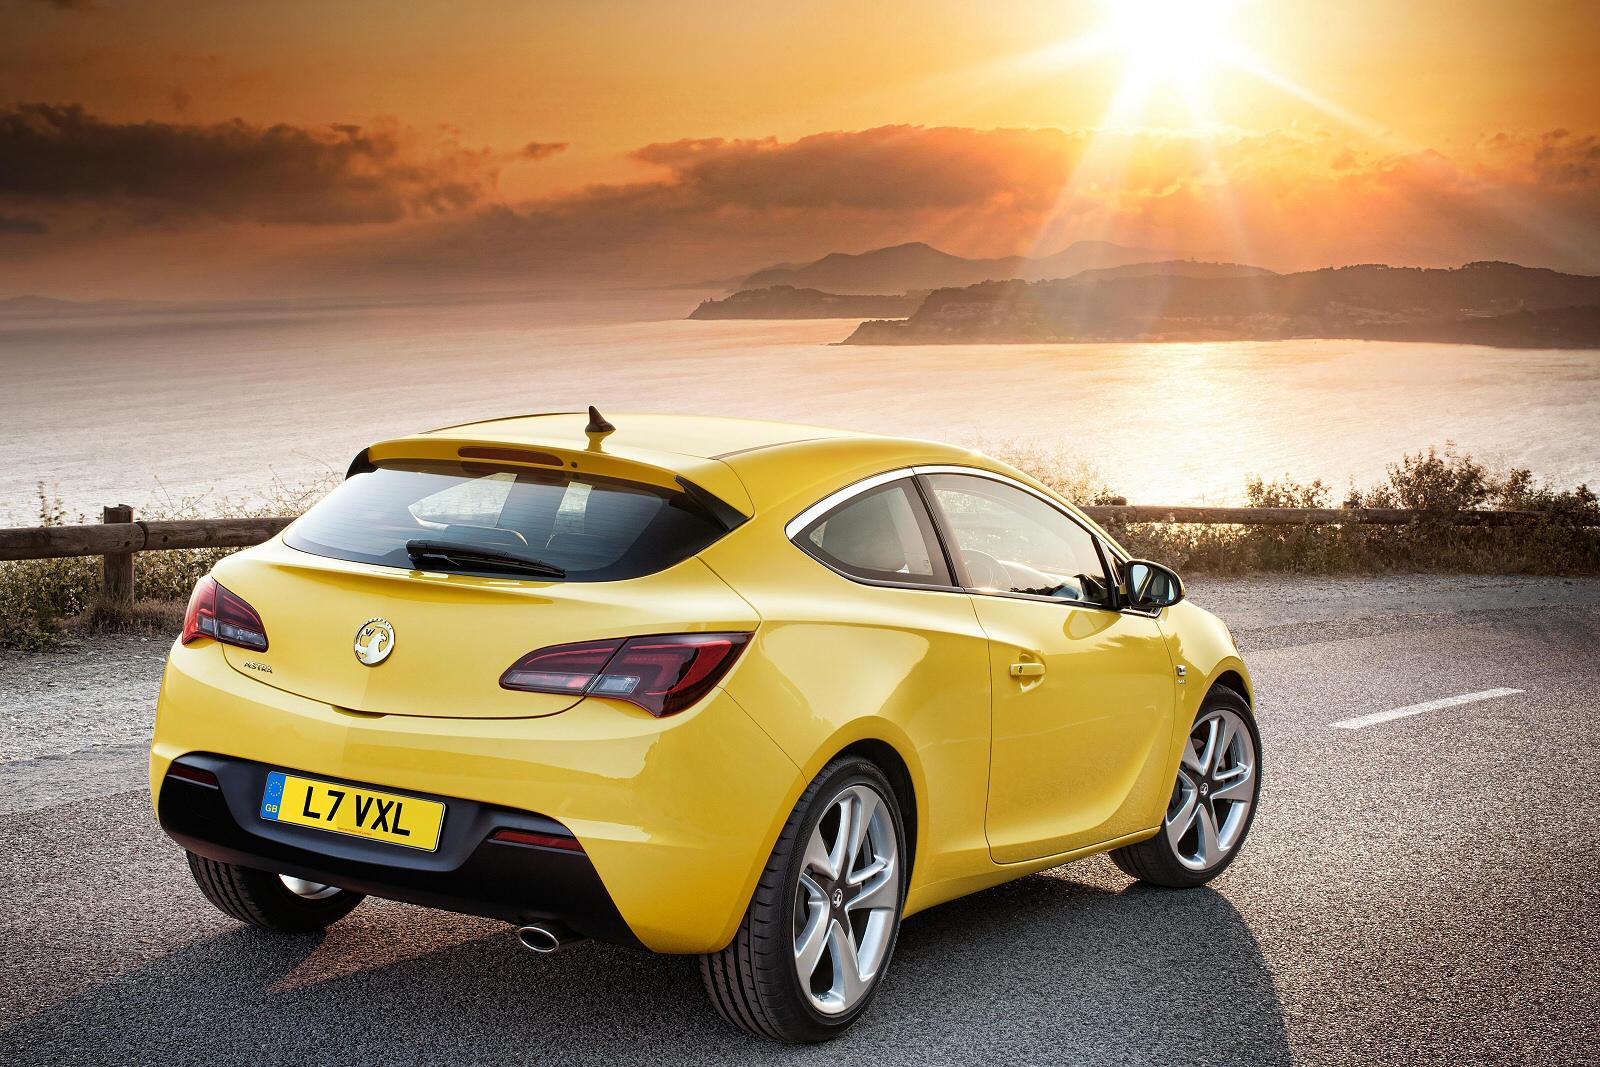 New Vauxhall Astra GTC